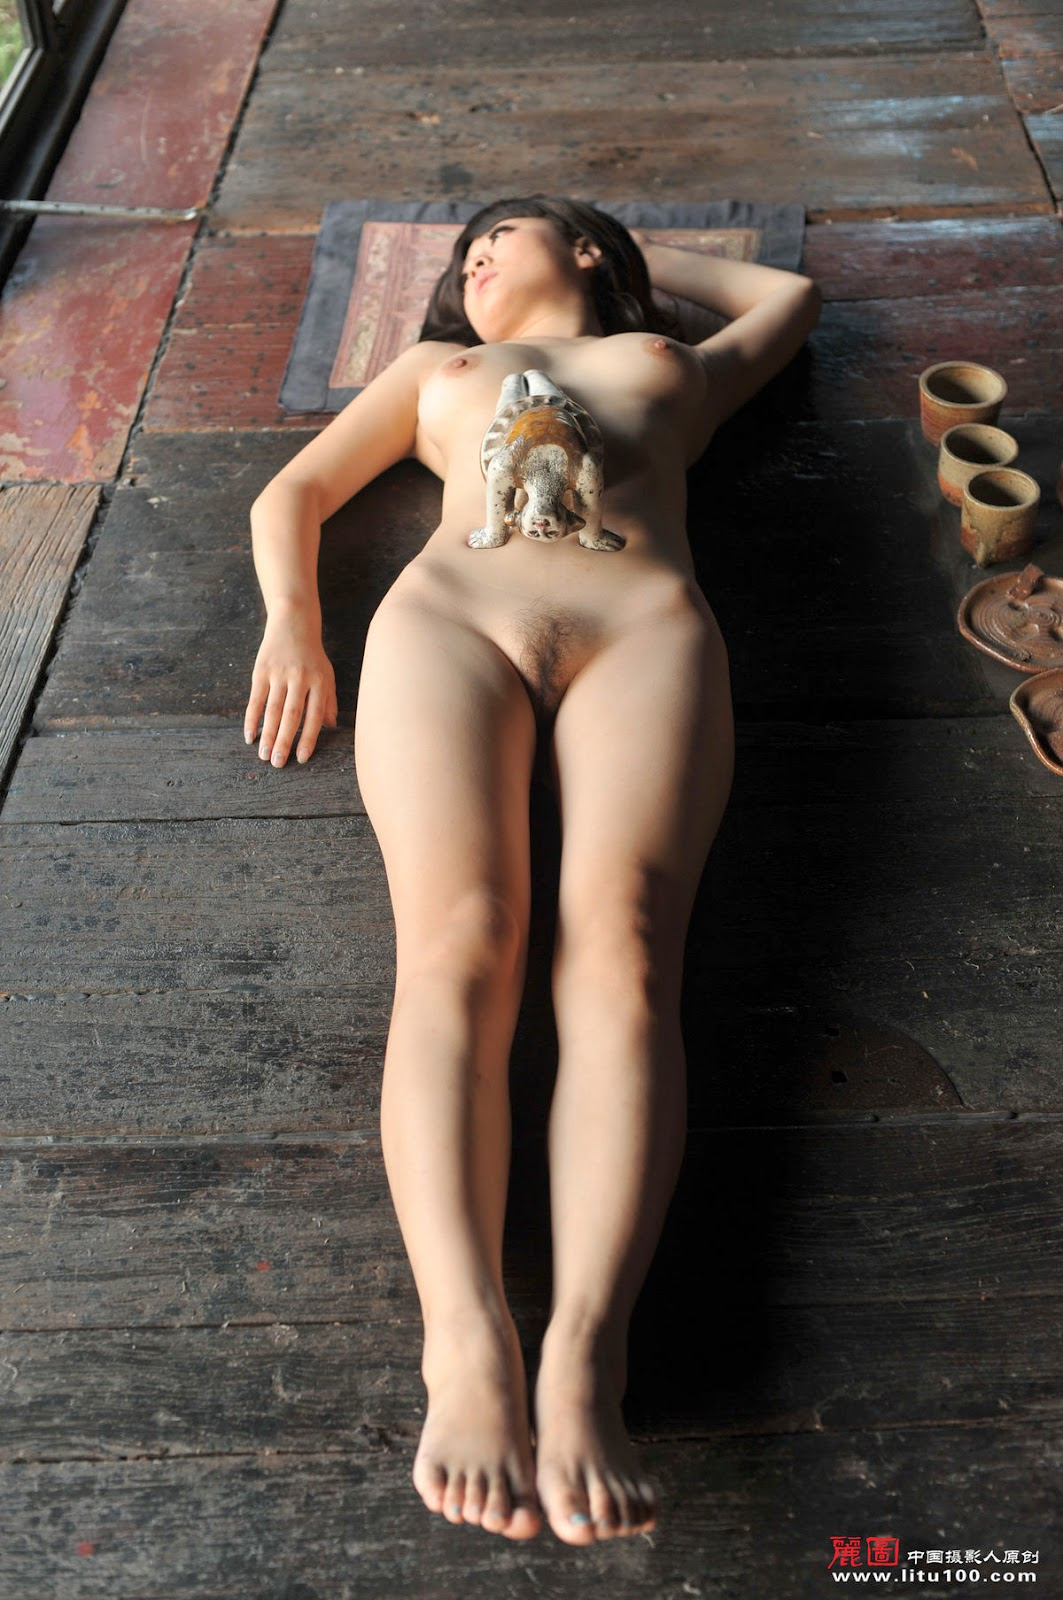 DSC 7213 - Chinese Nude Model Su Quan [Litu100]   18+ gallery photos